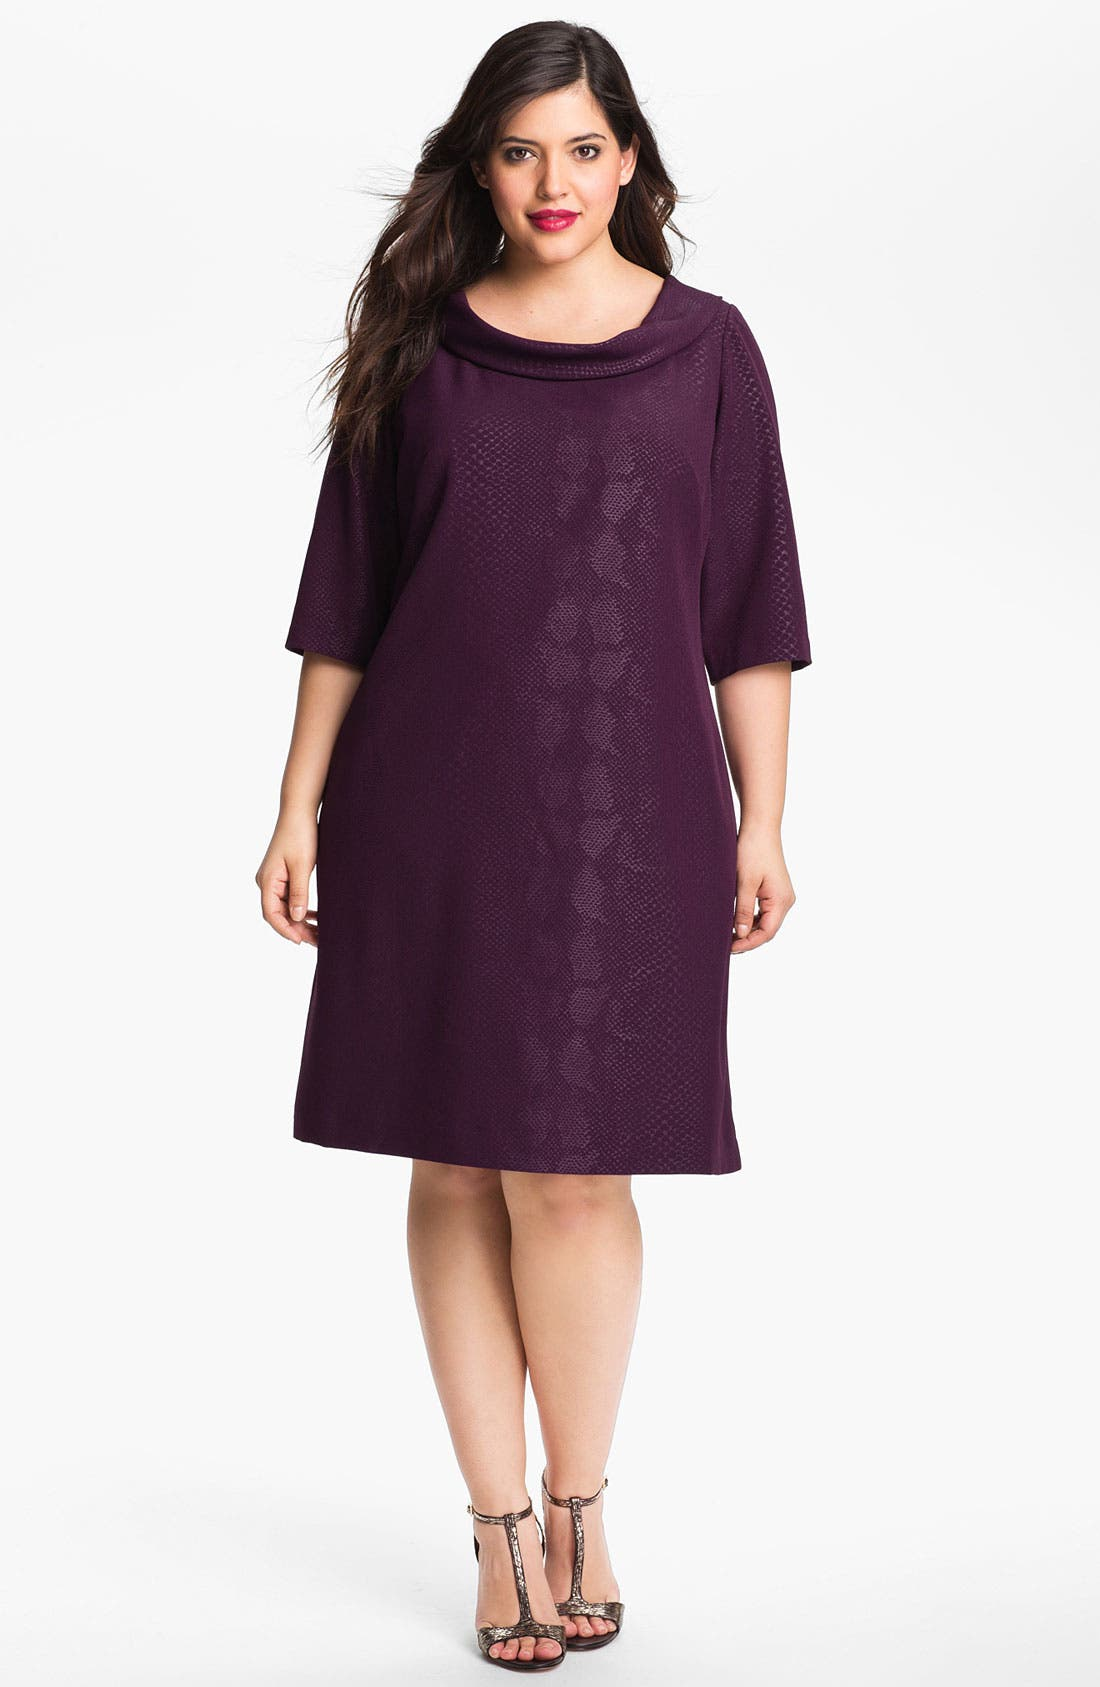 Alternate Image 1 Selected - Adrianna Papell Animal Print Shift Dress (Plus)